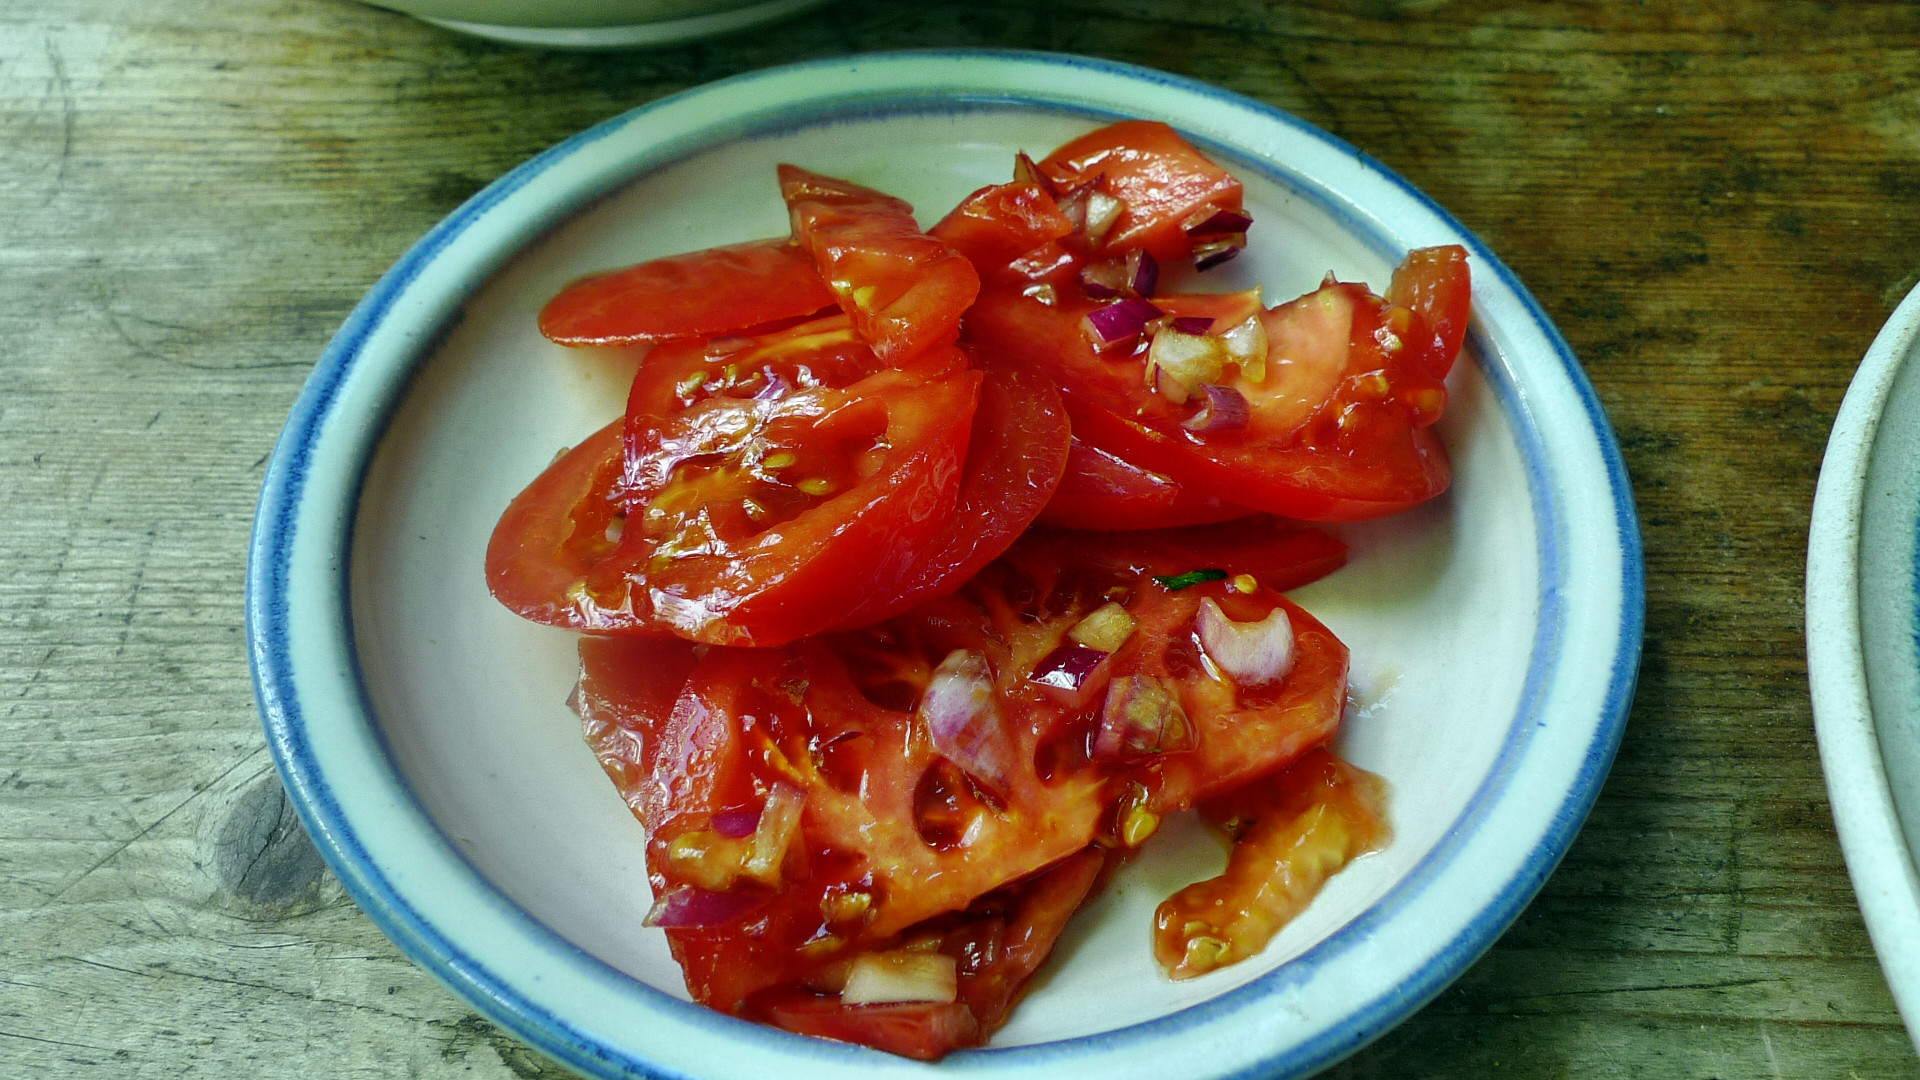 Kalte Kräutersuppe,gebratener Fenchel,Tomatensalat - 4.5.15   (12)